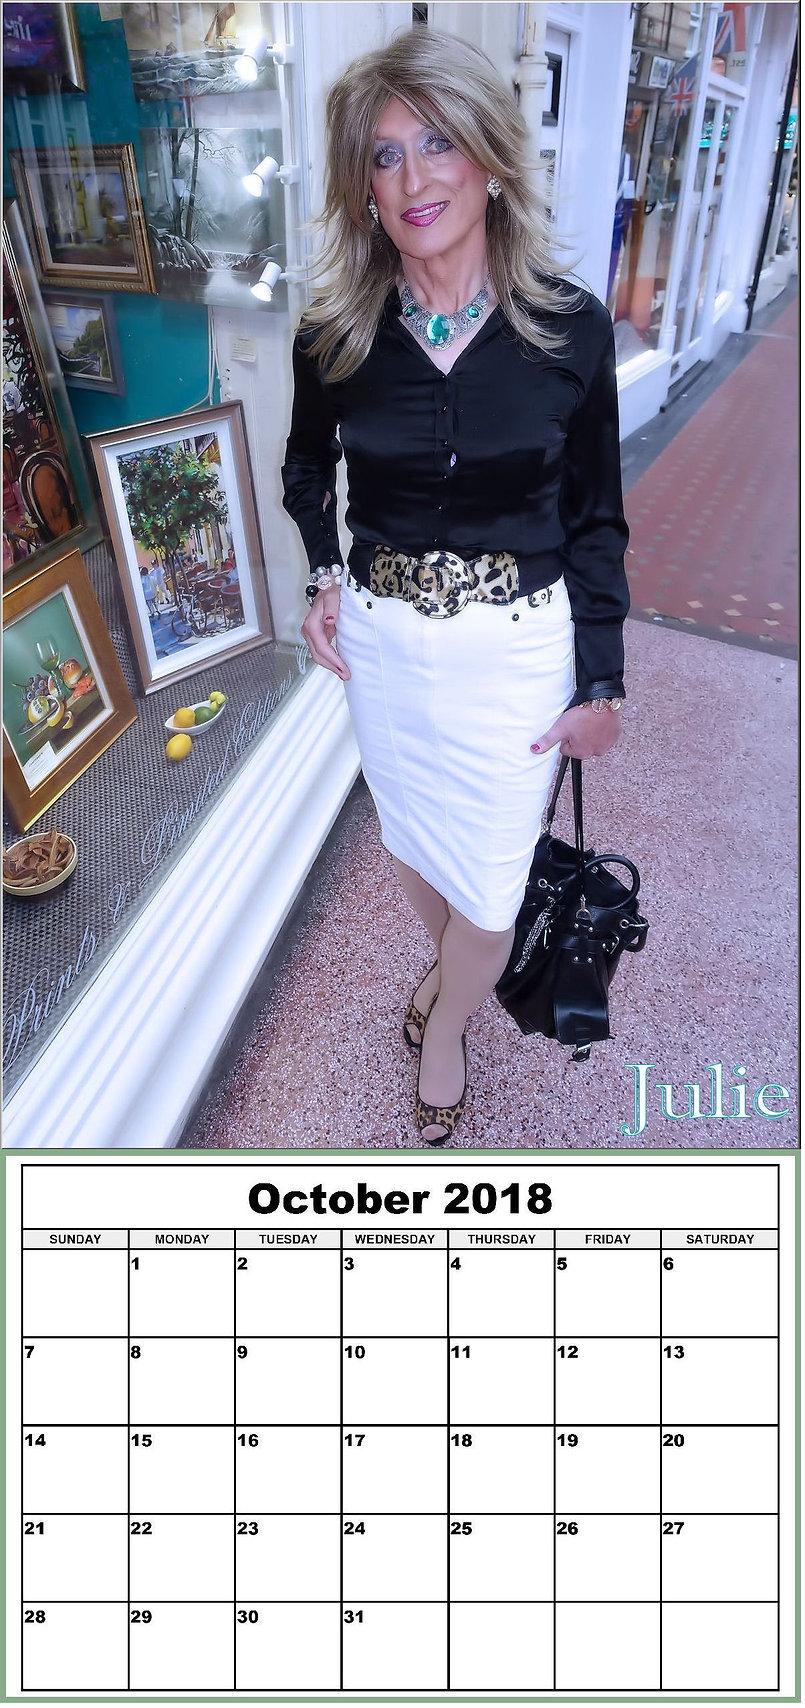 October Calendar Girl 2018.jpg